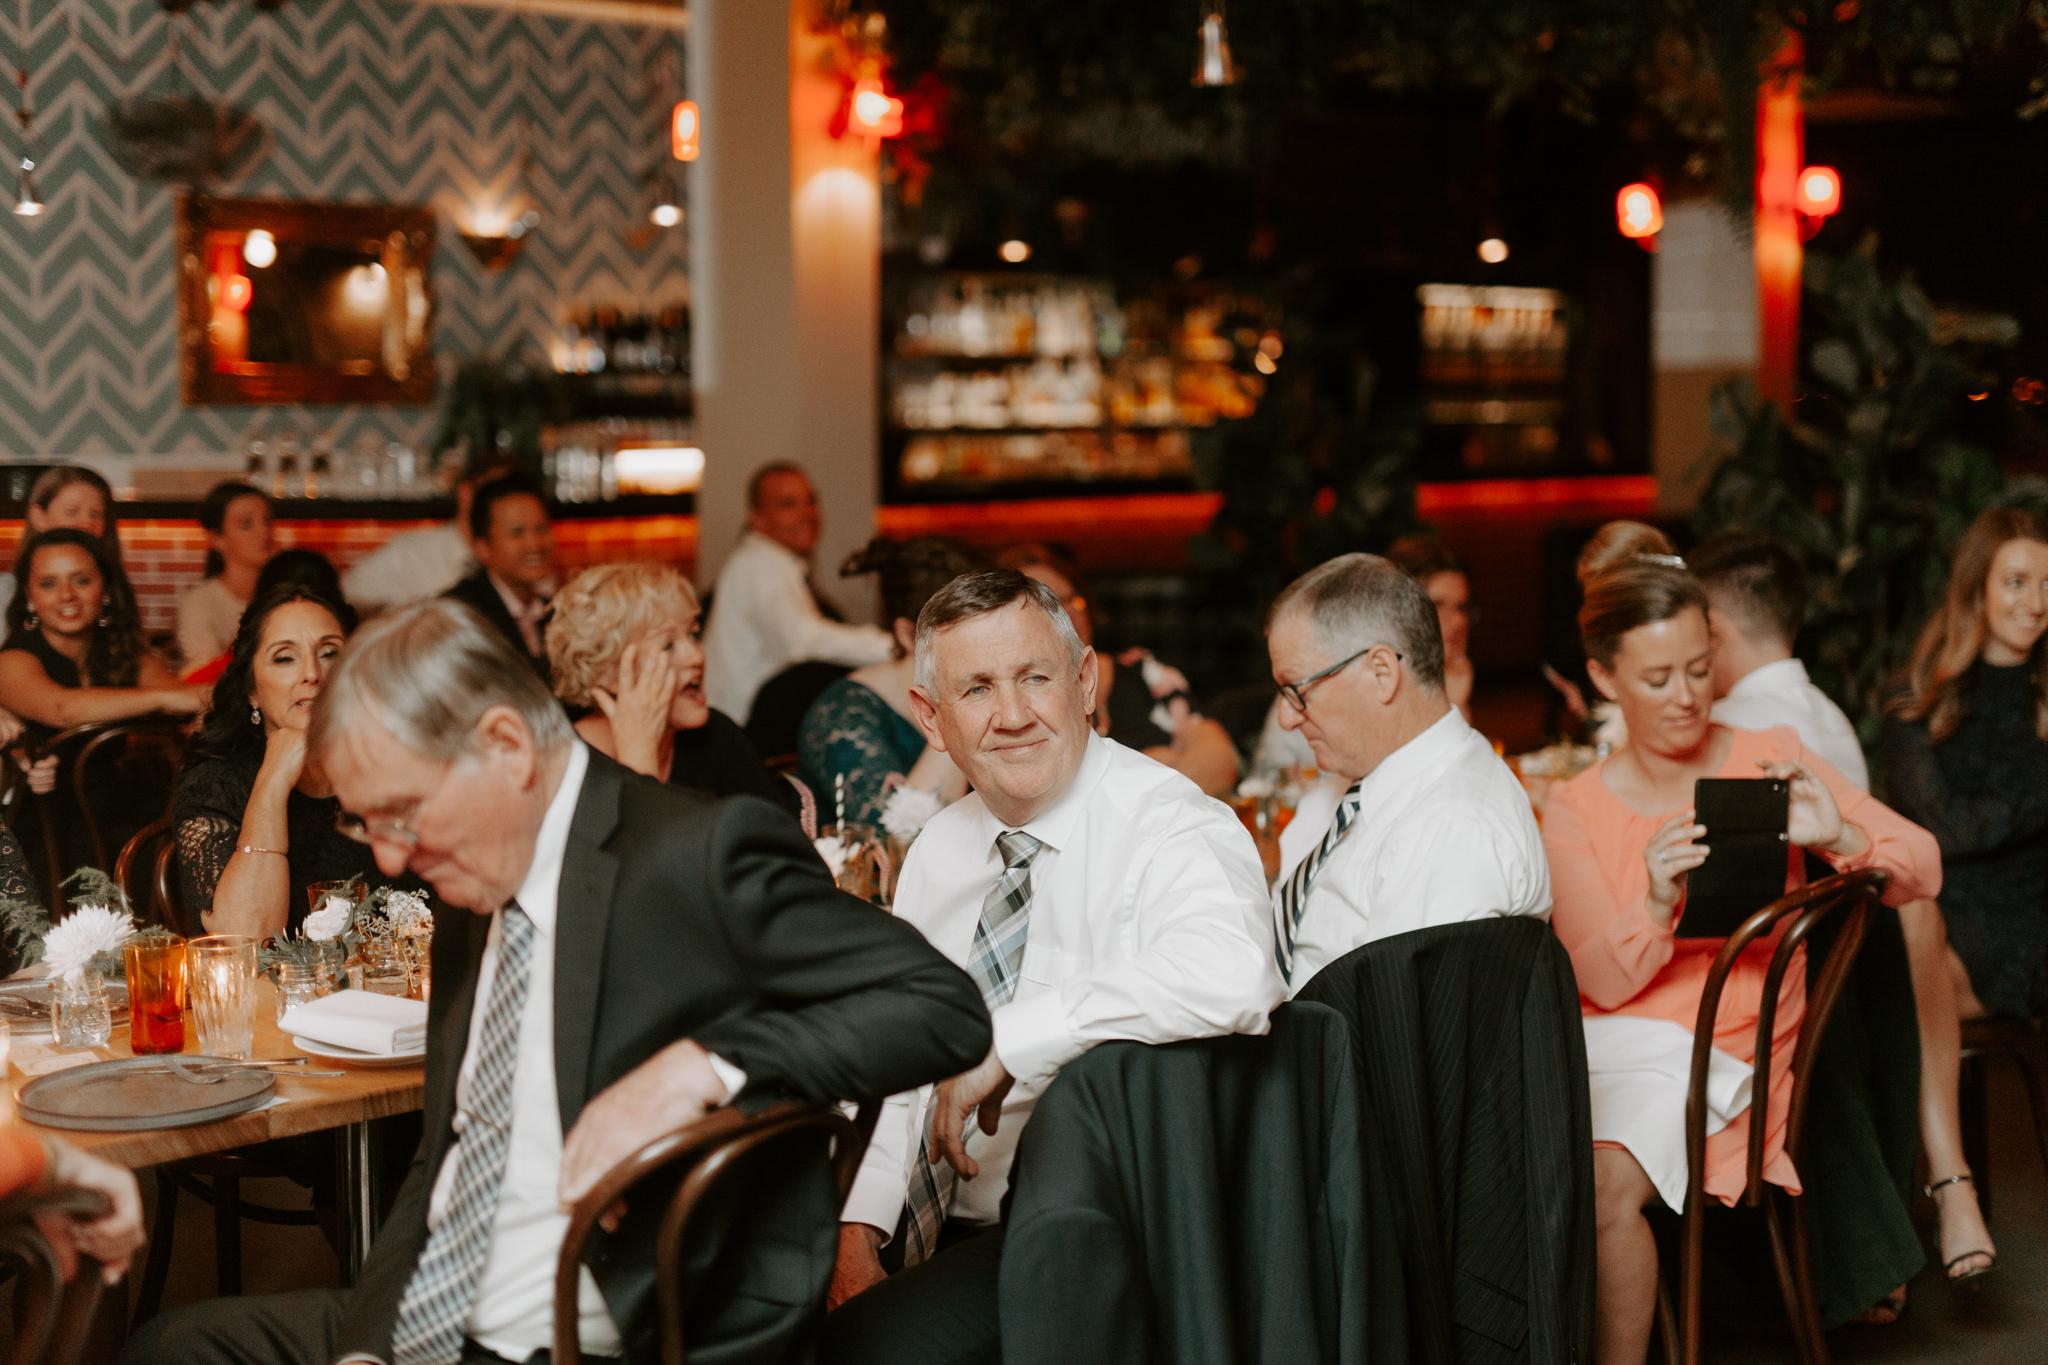 Panama-Dining-Room-wedding-emotionsandmath-044.jpg